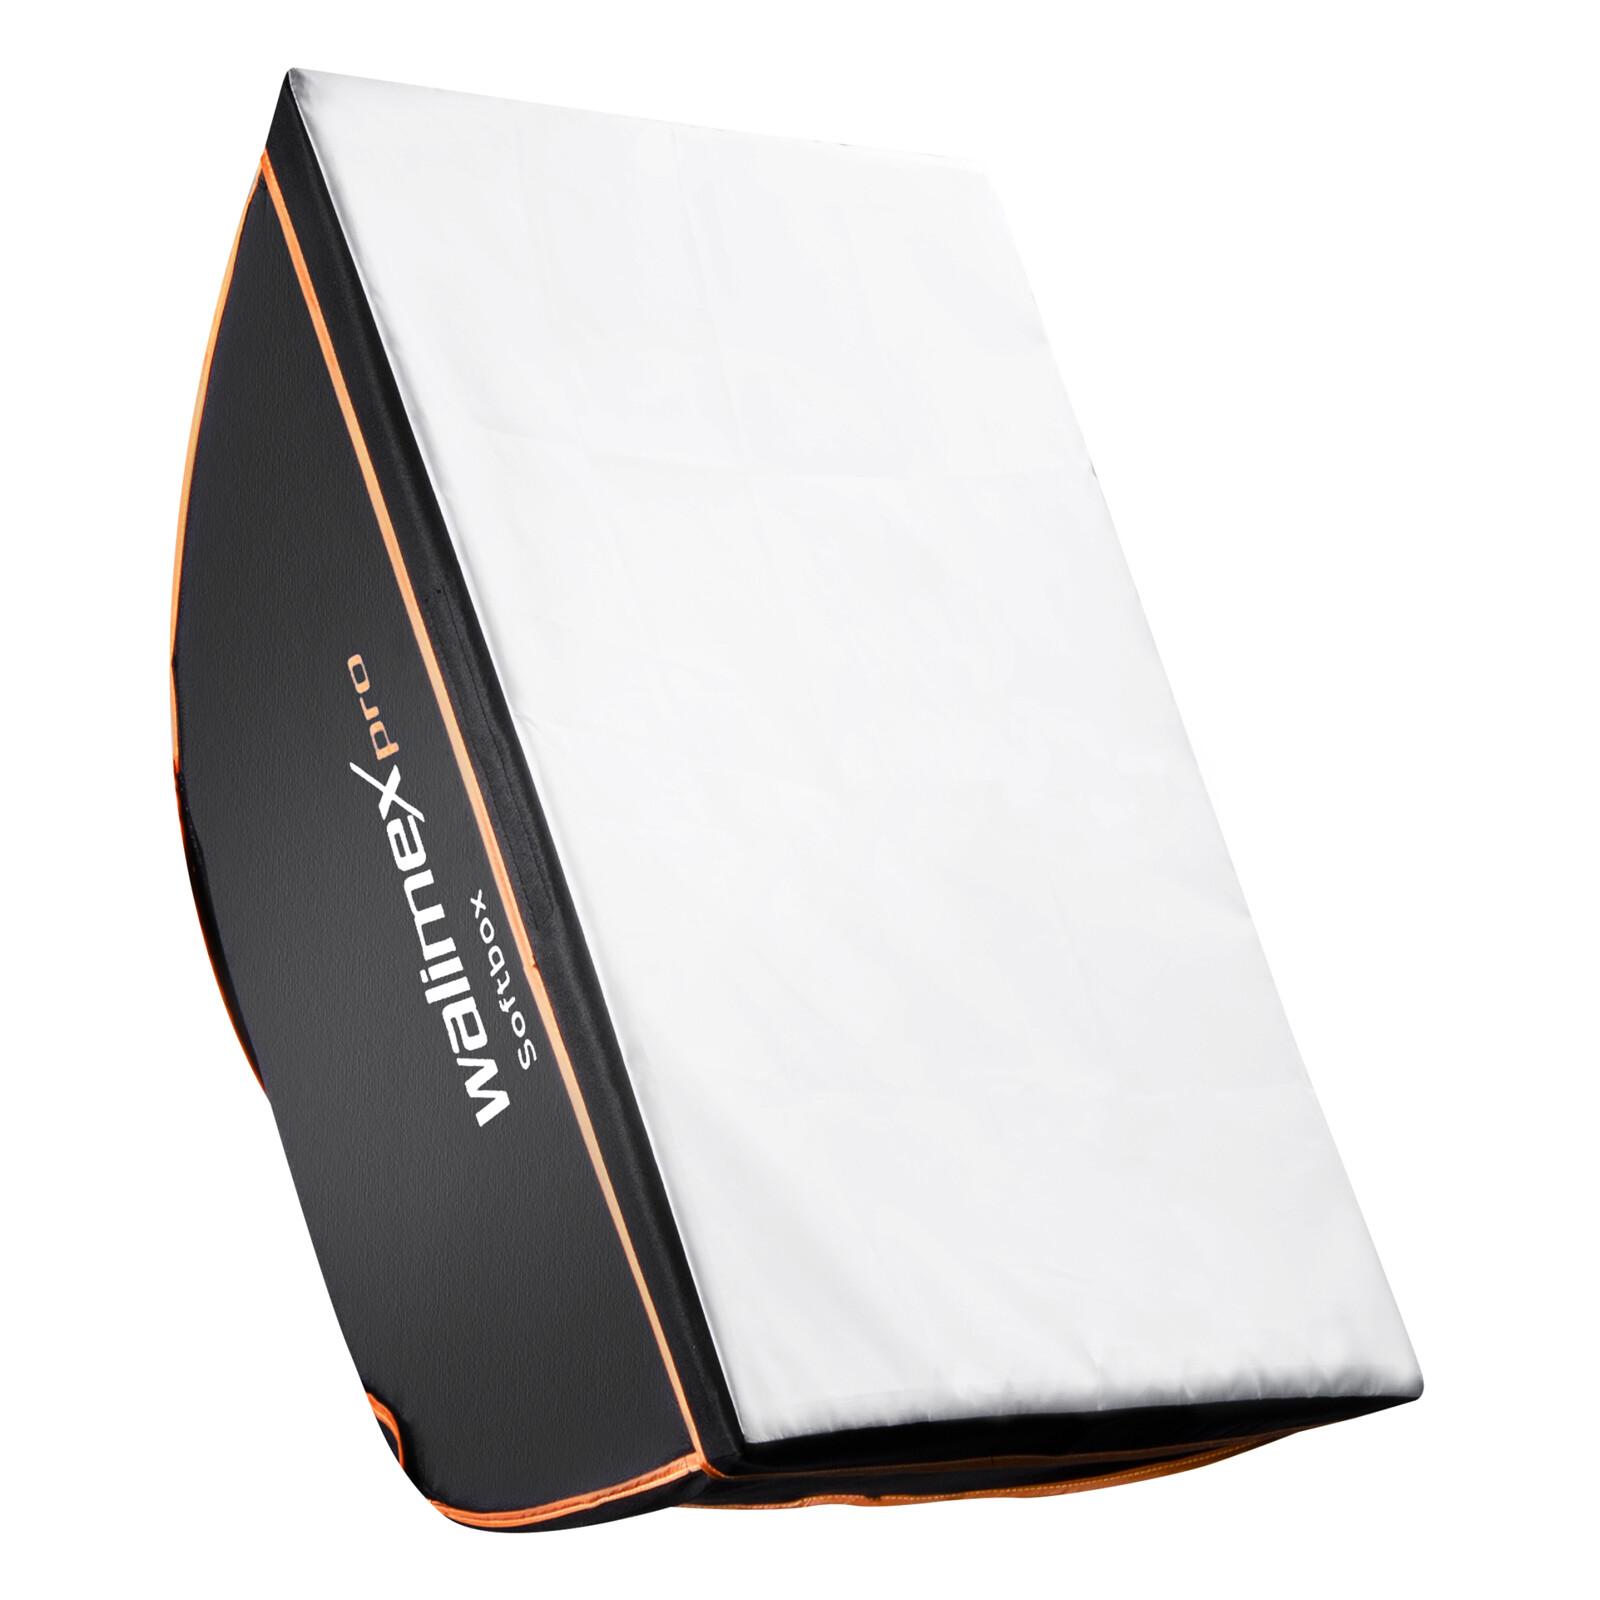 walimex pro Softbox OL 75x150cm Aurora/Bowens